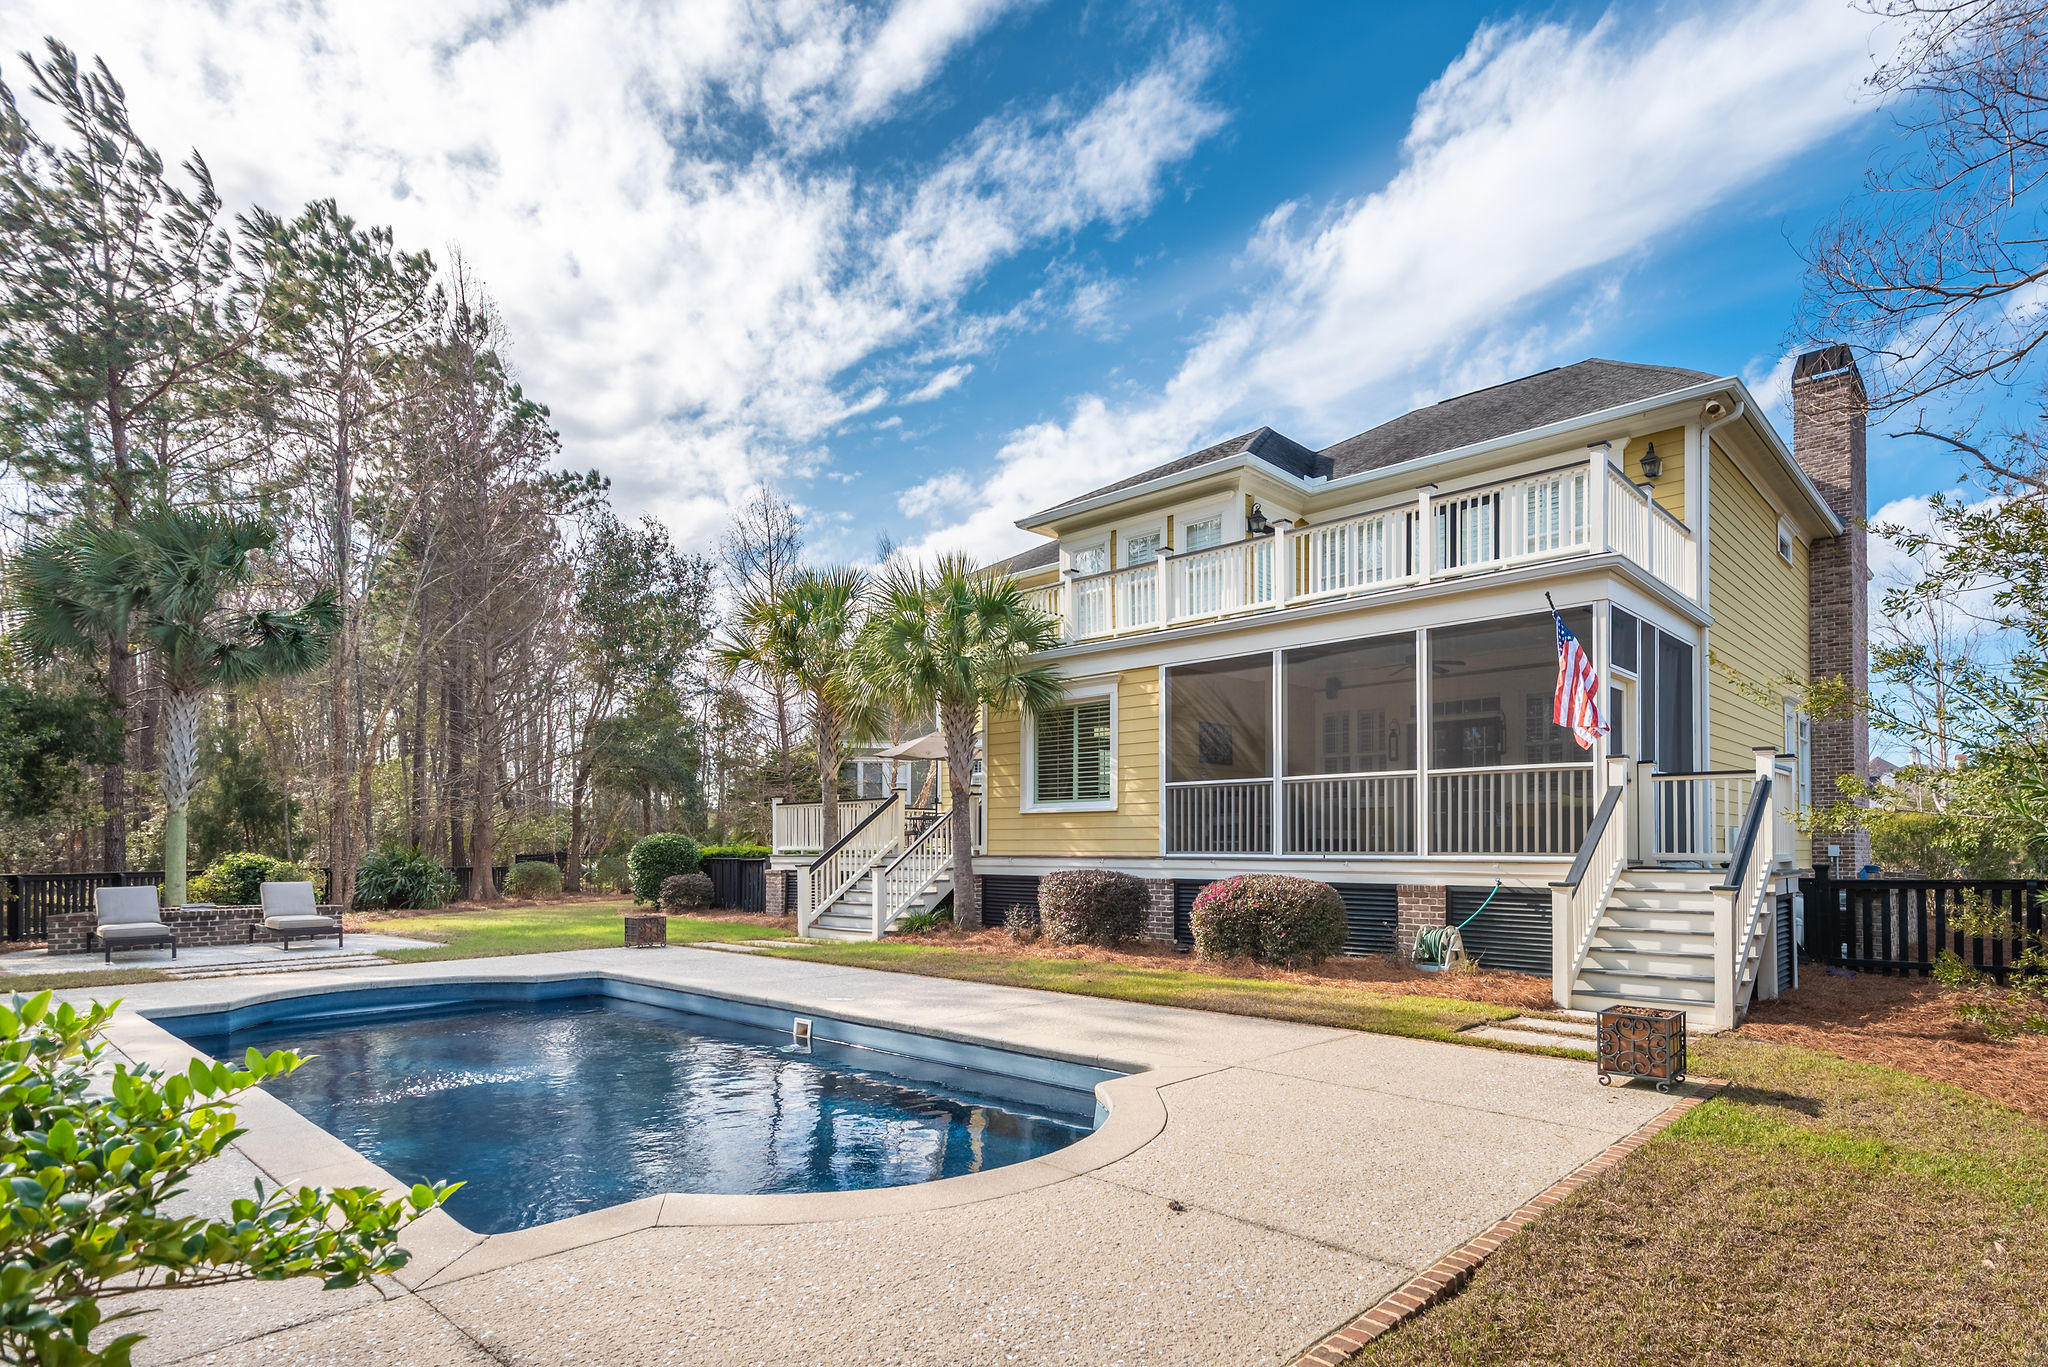 Dunes West Homes For Sale - 1305 King Bird, Mount Pleasant, SC - 18